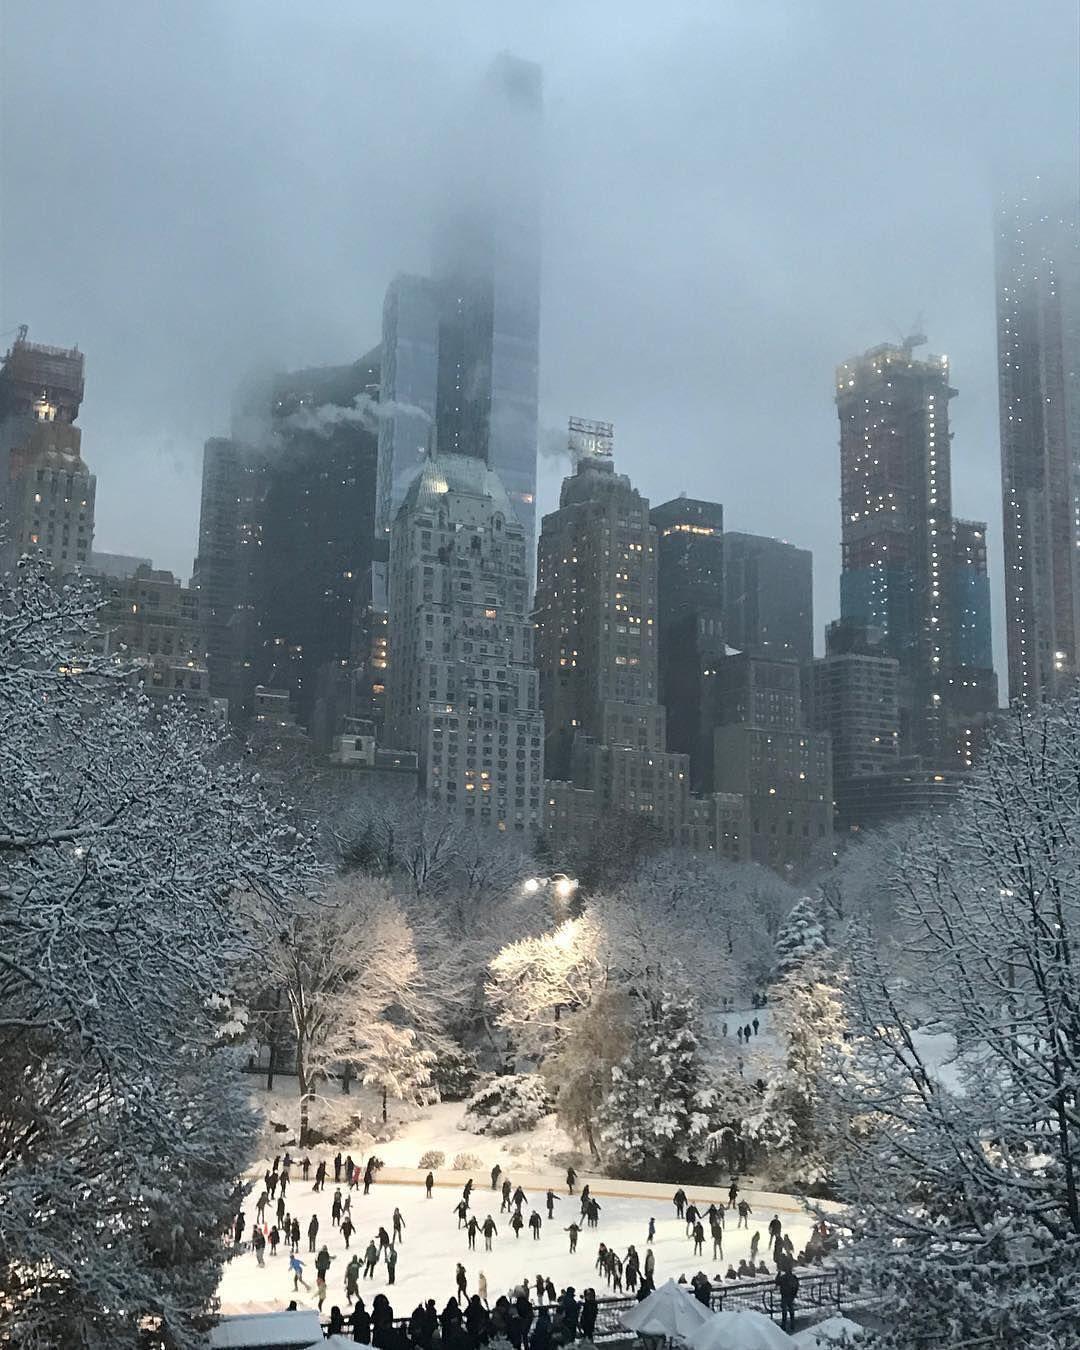 New York Weihnachten.Top 10 Lighting Stores In New York Nypeasia Now I Am